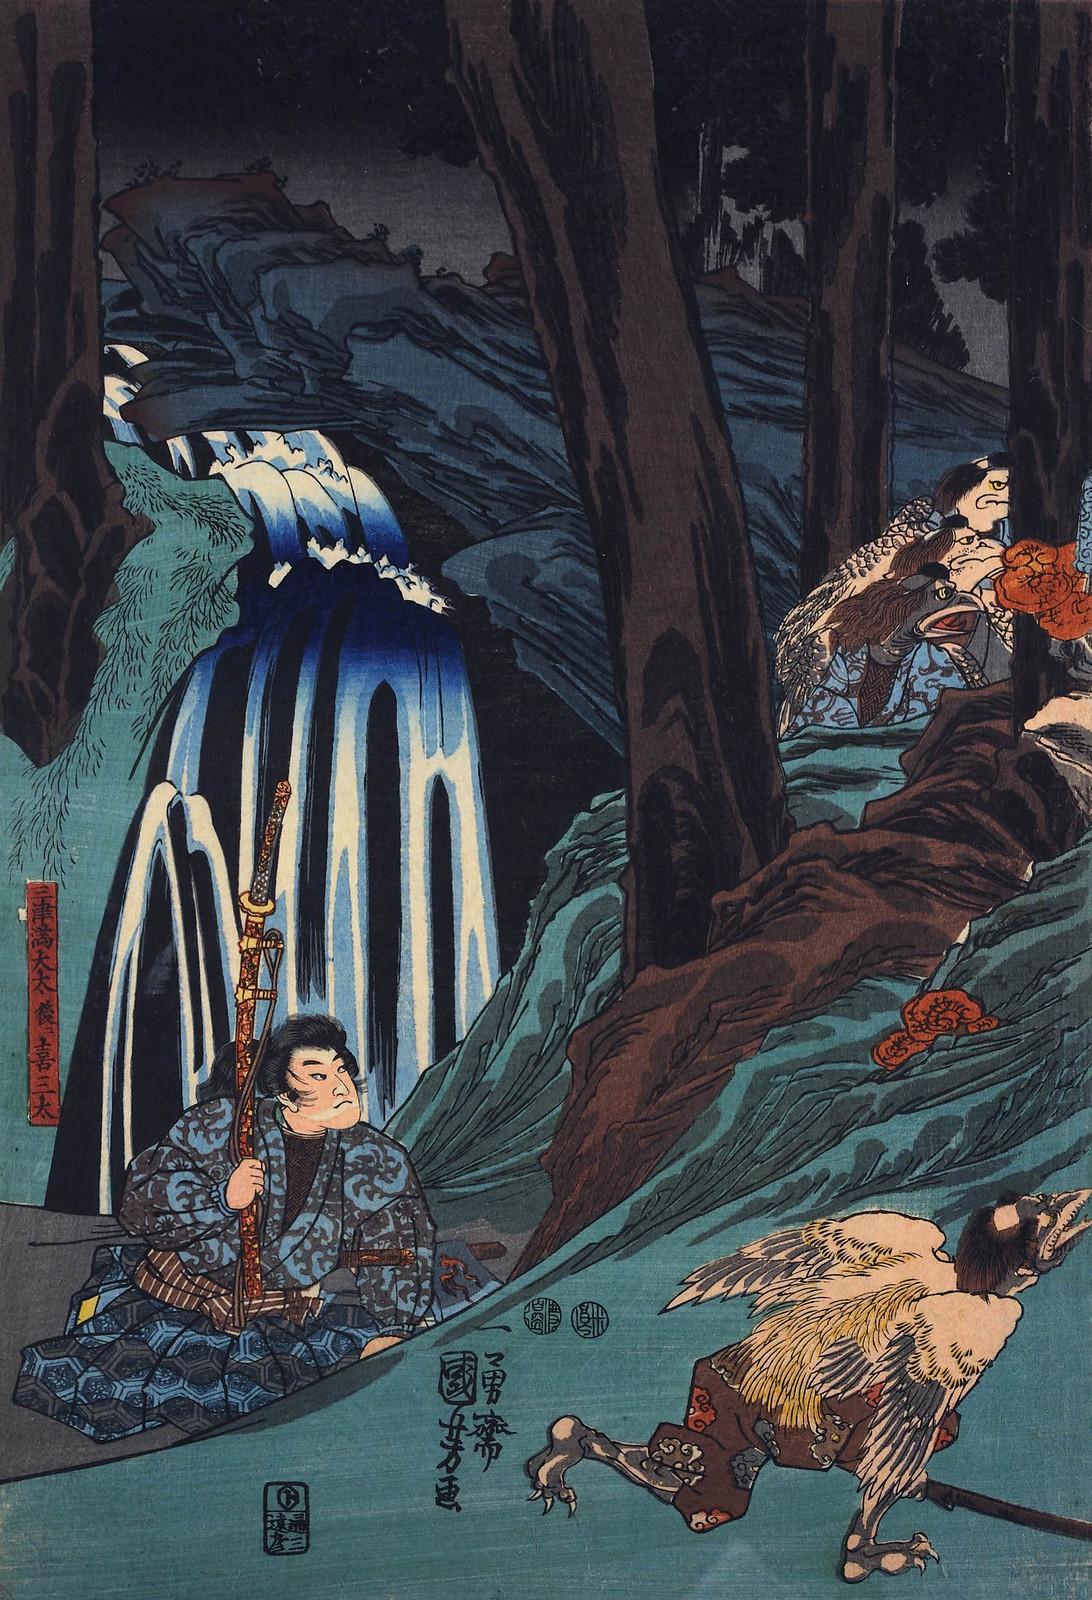 Utagawa Kuniyoshi - Sojobo, King of the Tengu, and Yoshitsune leaping in the air, 1847-52 (left panel)